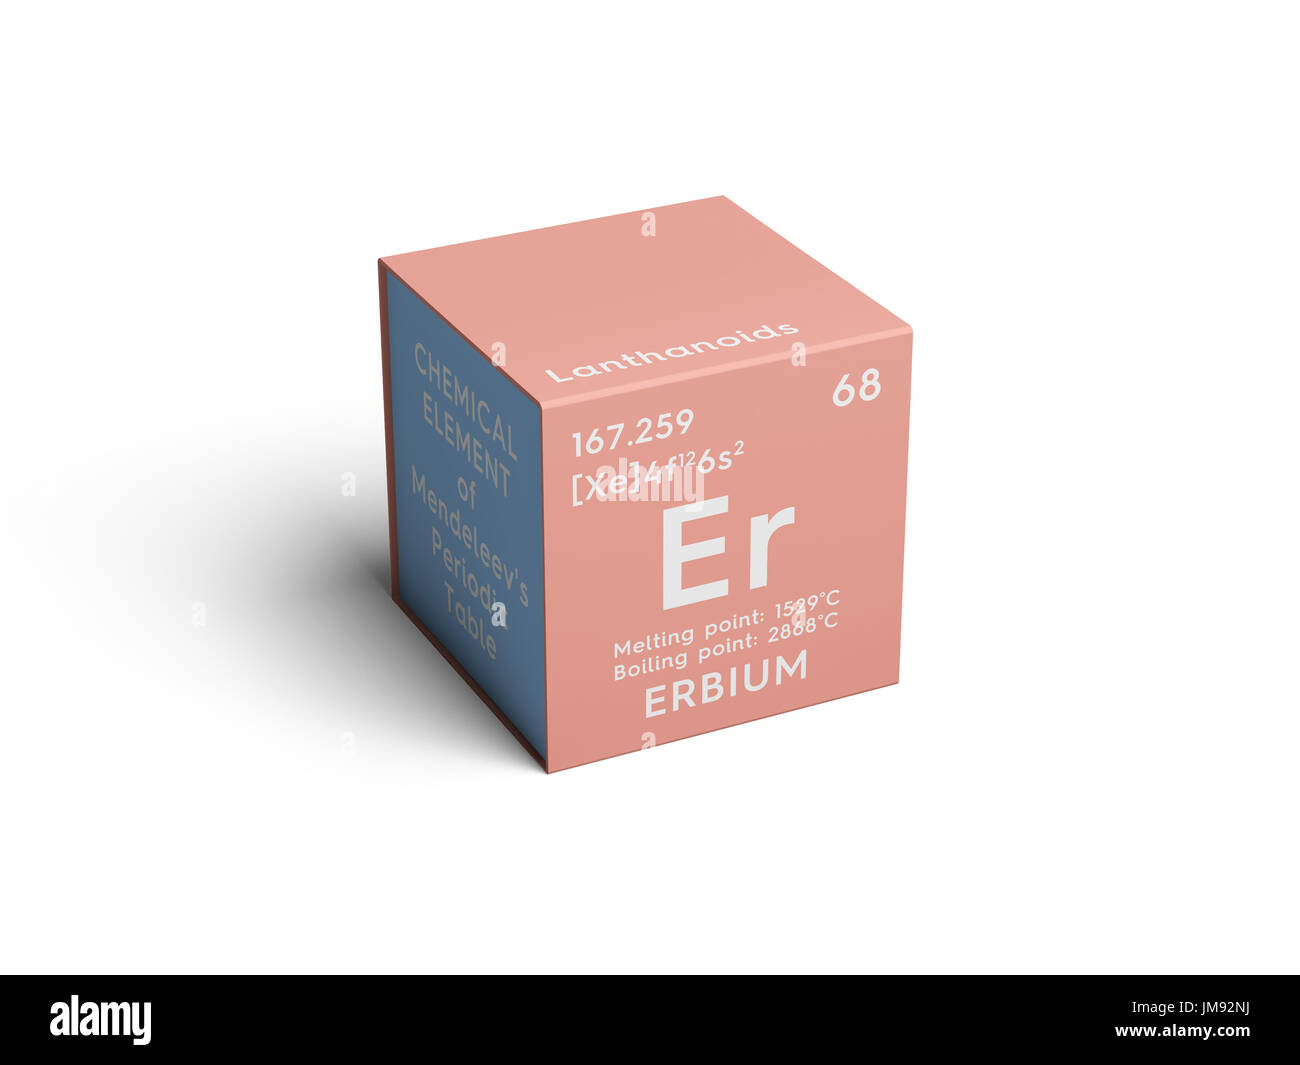 Erbium Lanthanoids Chemical Element Of Mendeleevs Periodic Table